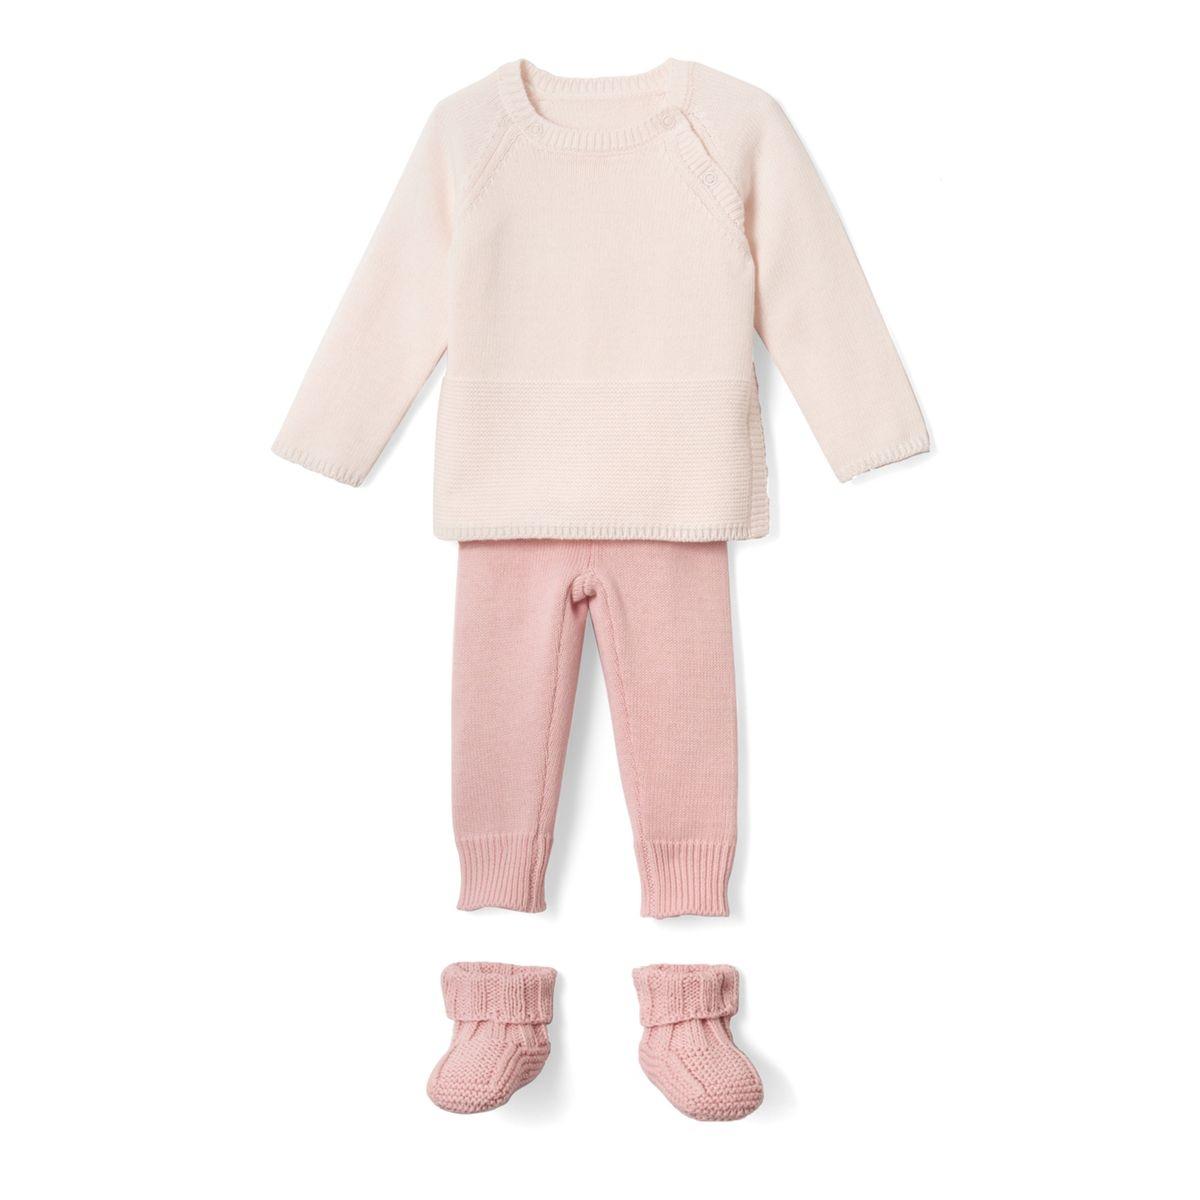 Ensemble tricot naissance 0 mois - 2 ans